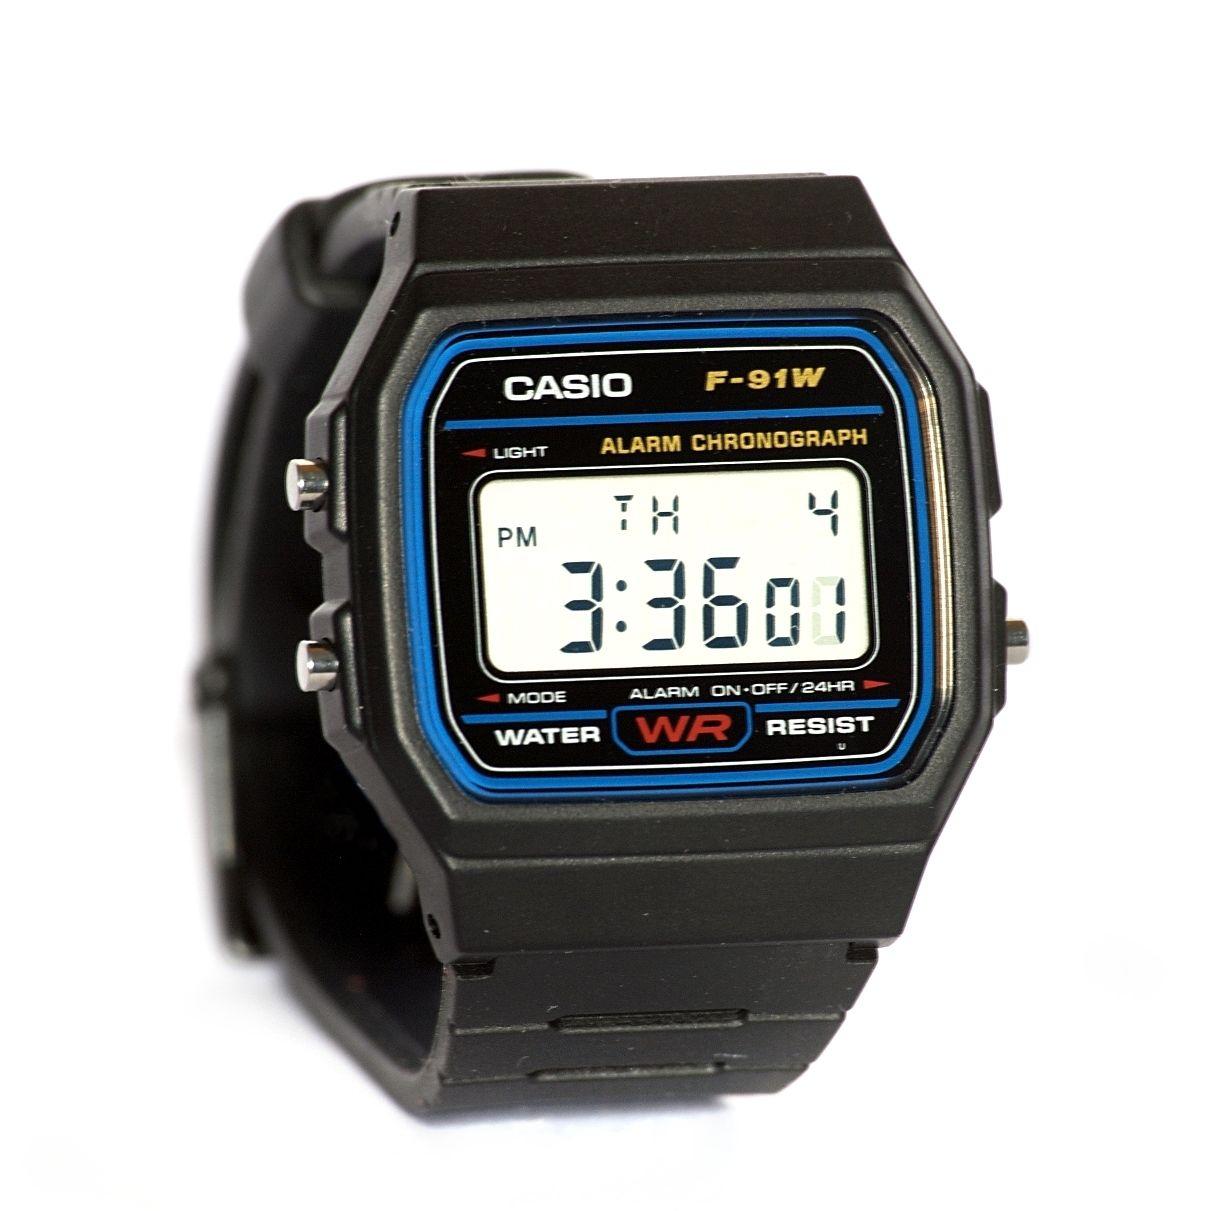 Kultowy zegarek Casio F-91W